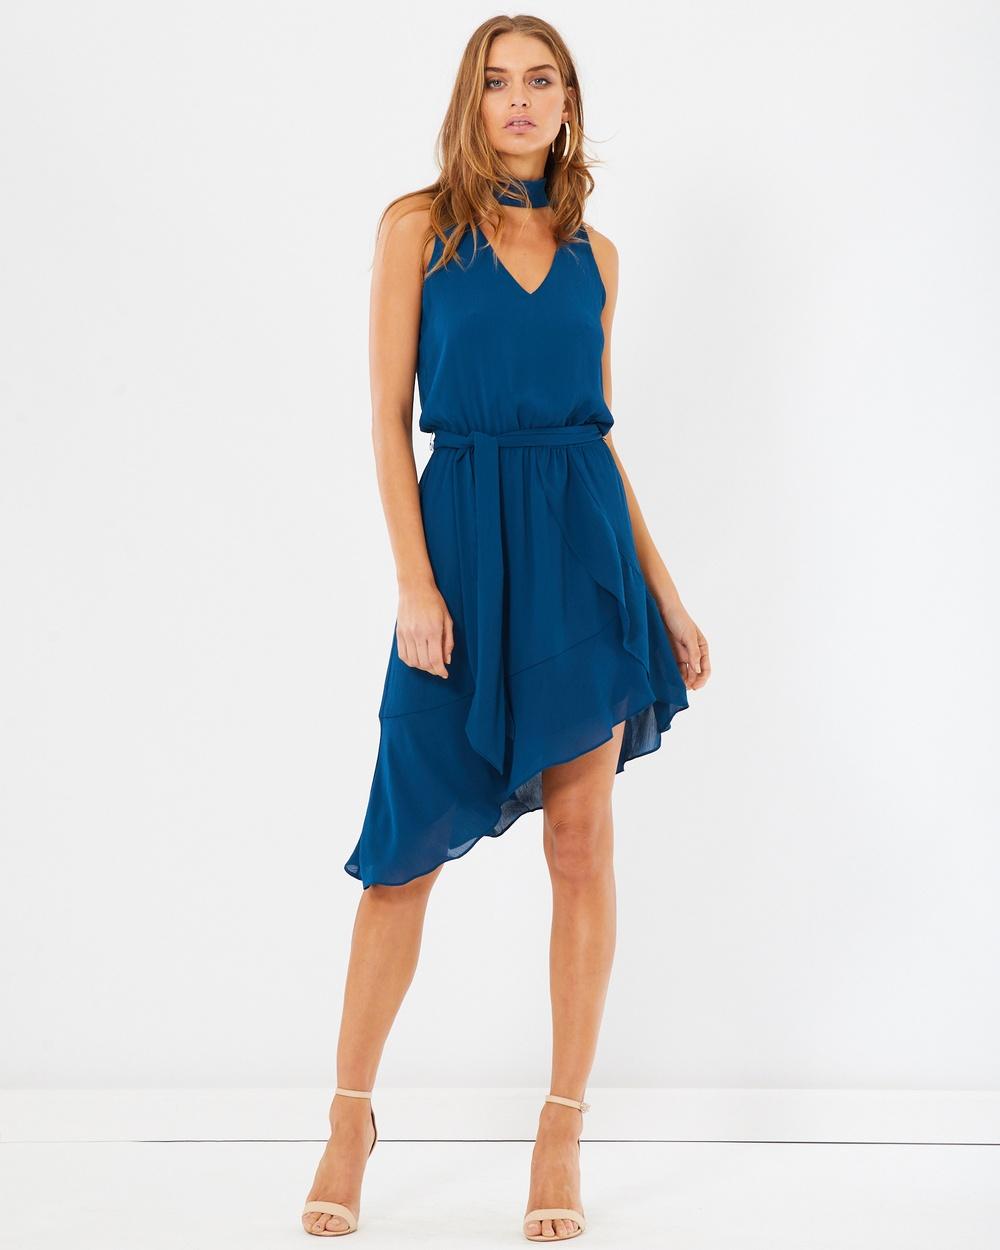 Tussah Stephie Ruffle Dress Dresses Teal Stephie Ruffle Dress